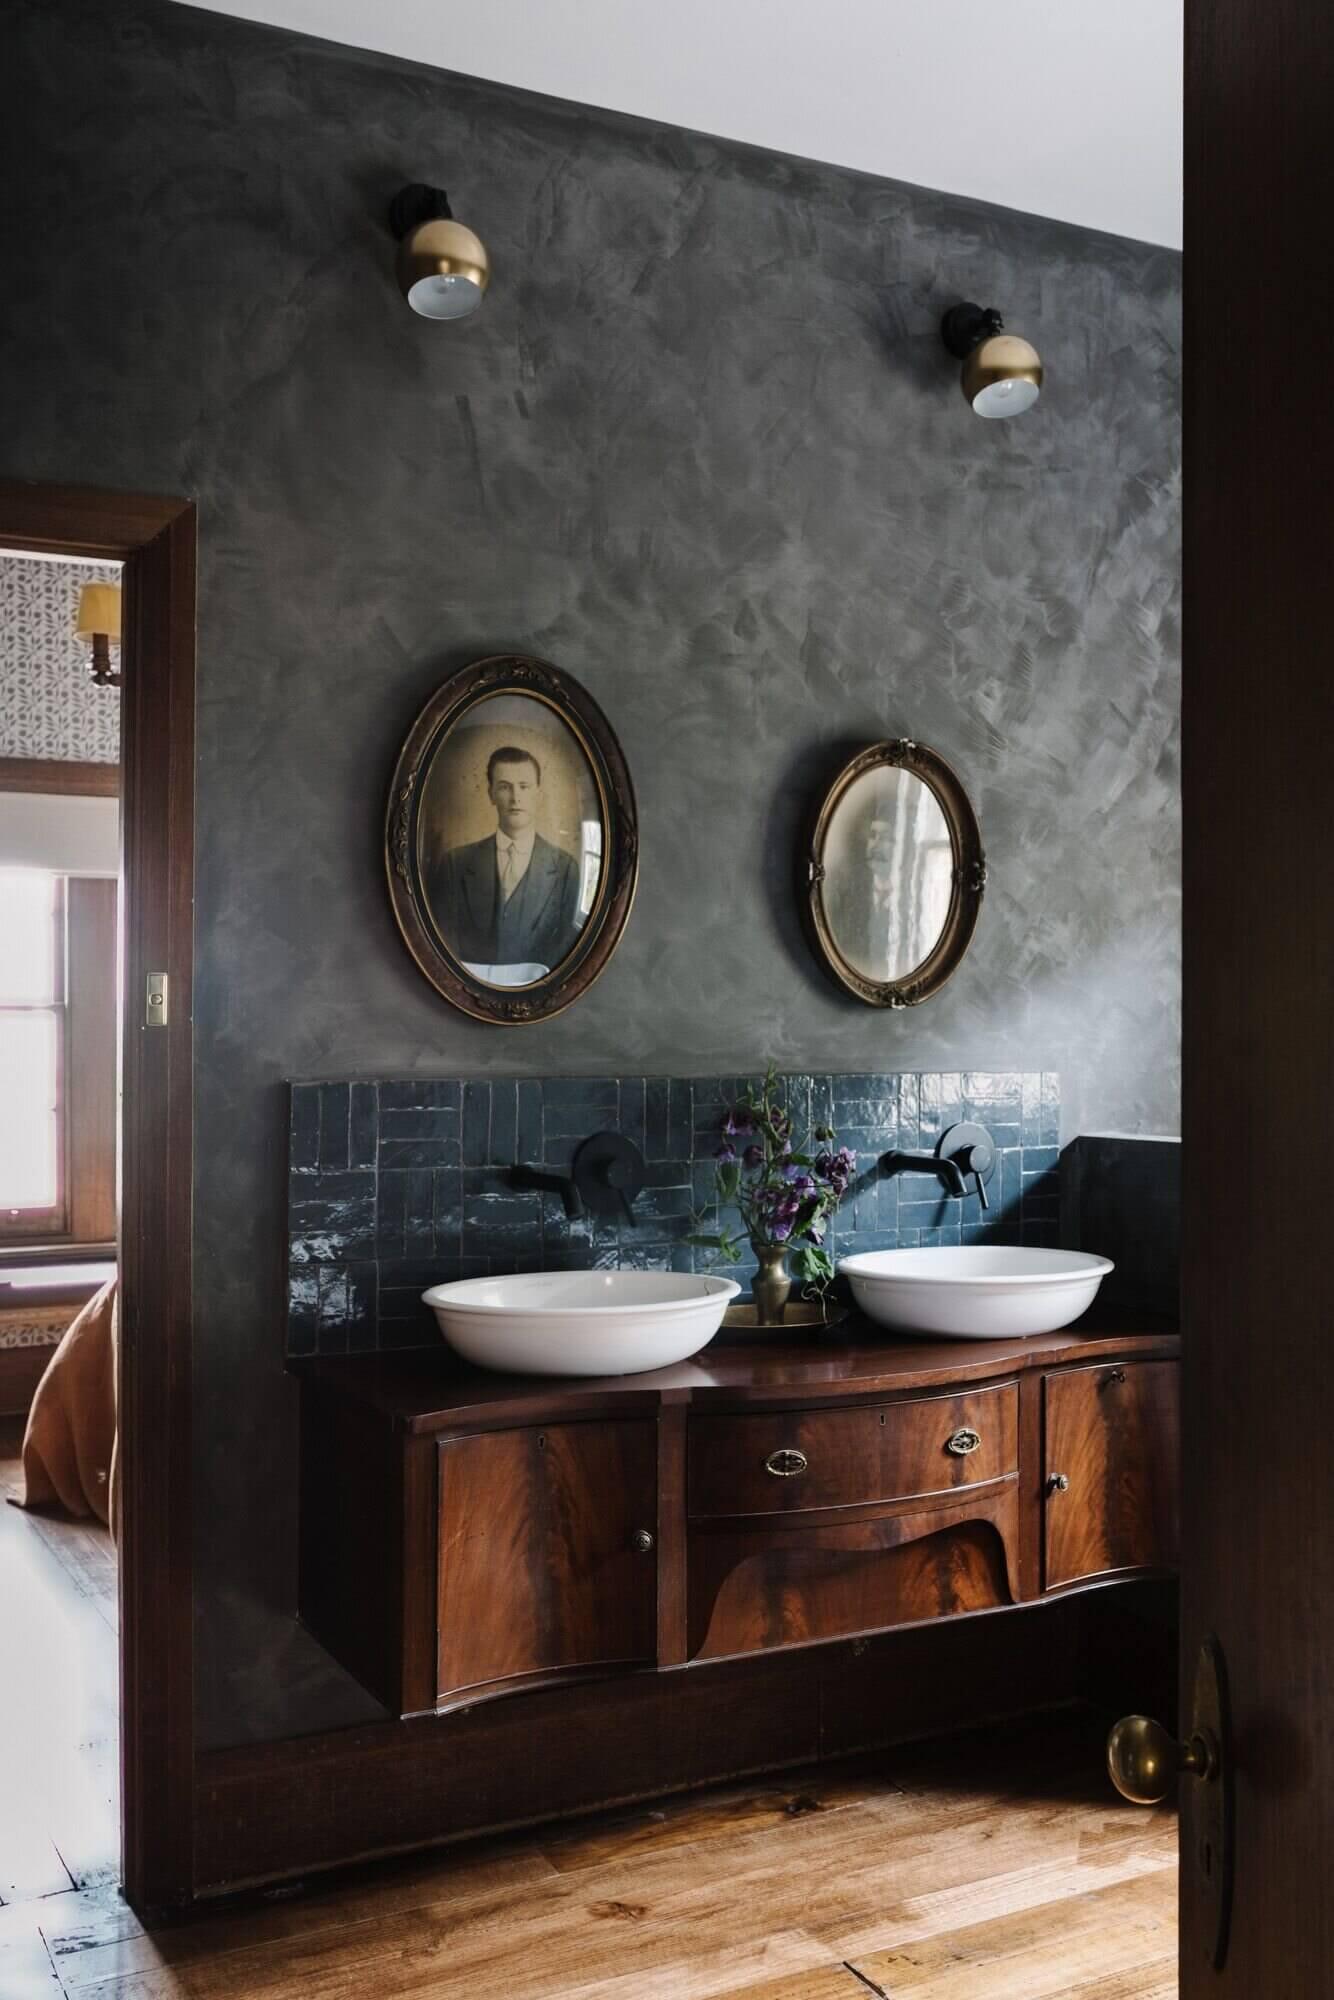 Ethelmont Rise | A Beautiful Vintage Airbnb on Tasmania